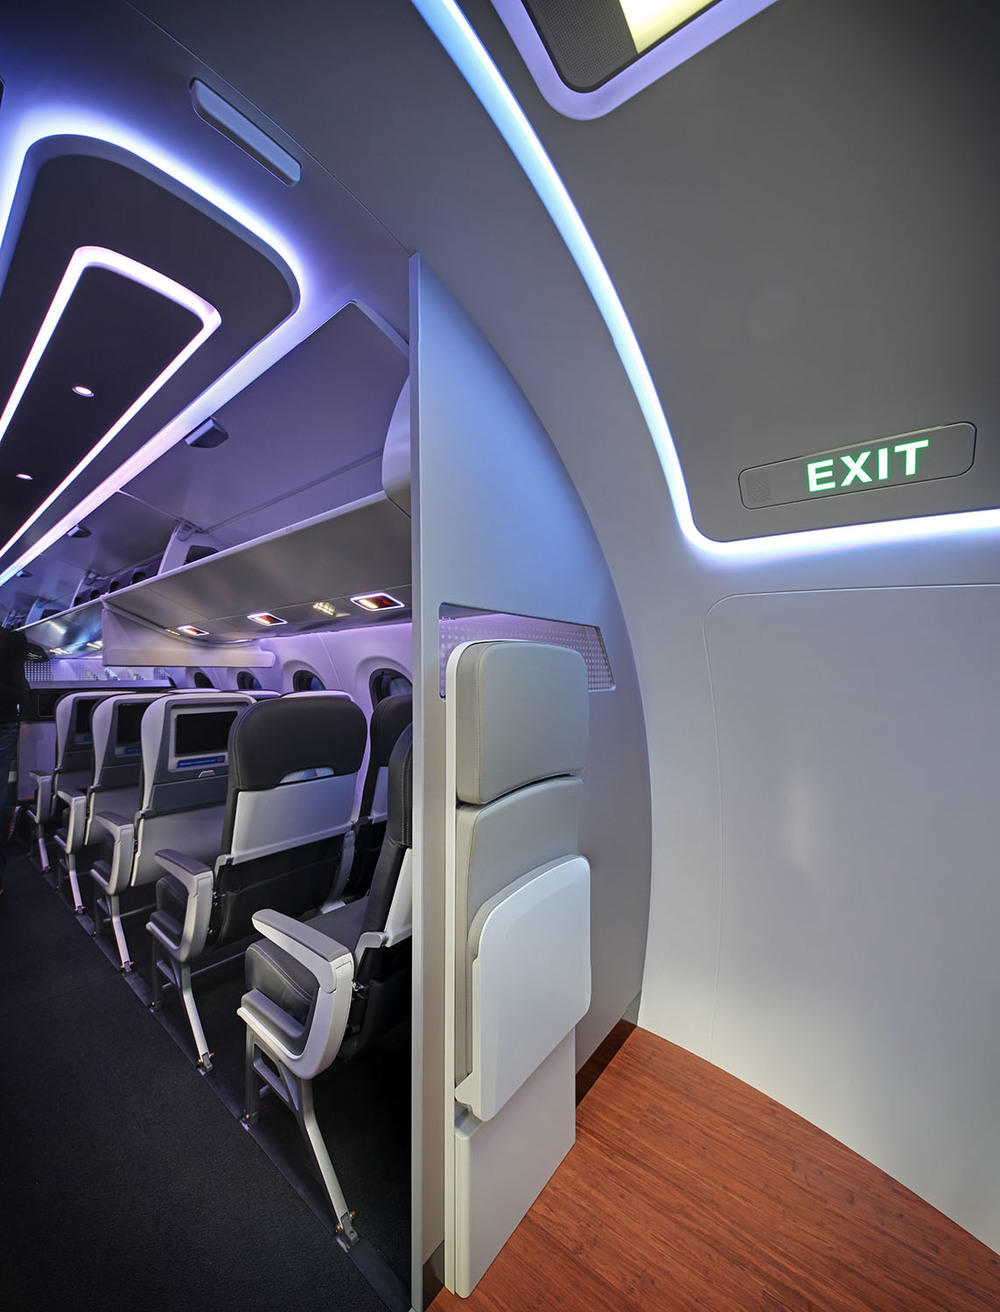 Inside E2 mock-up, Farnborough Airshow, UK